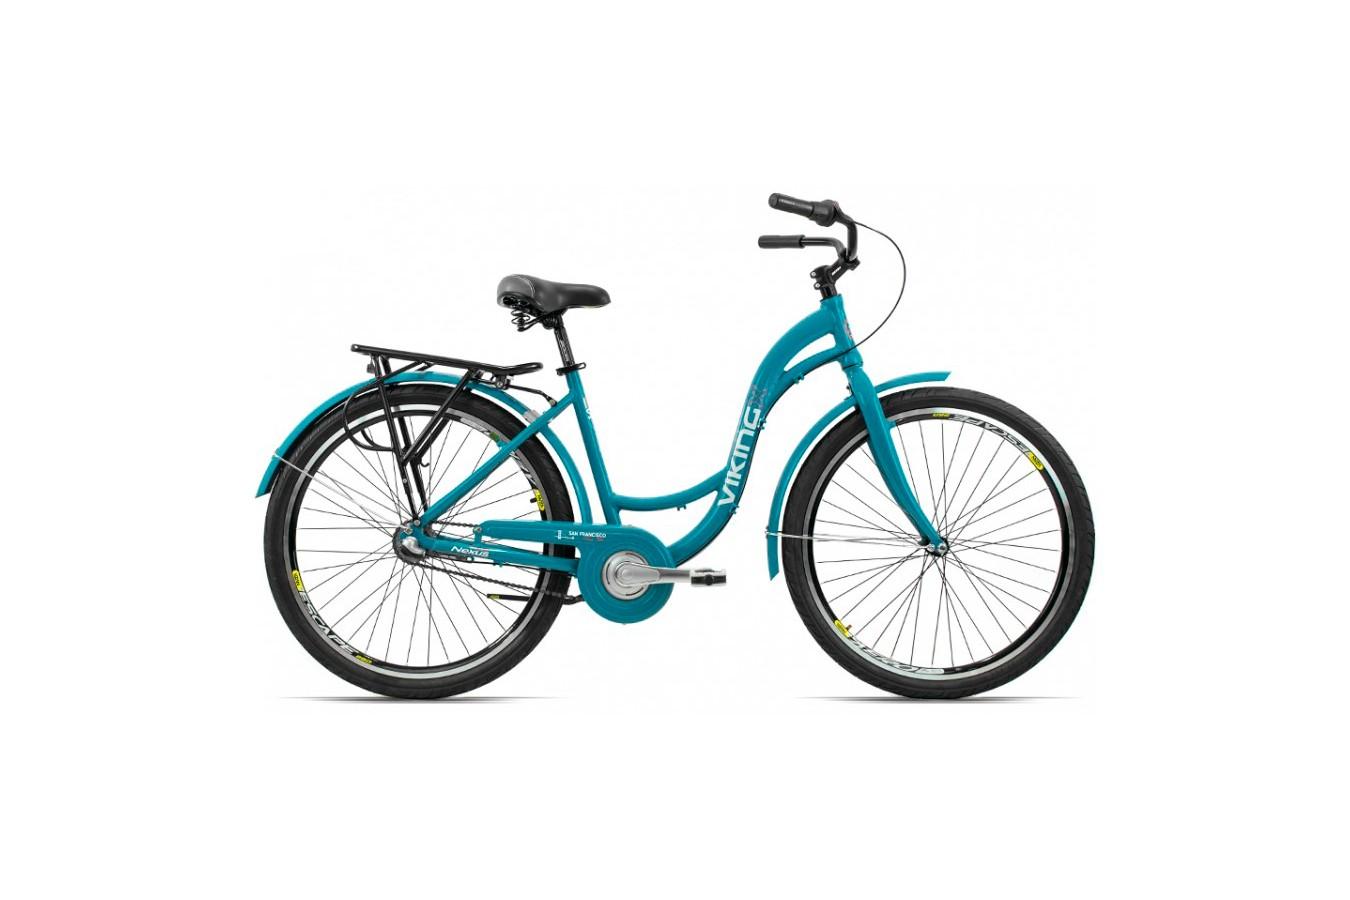 Bicicleta Passeio San Francisco 3v Nexus - VikingX